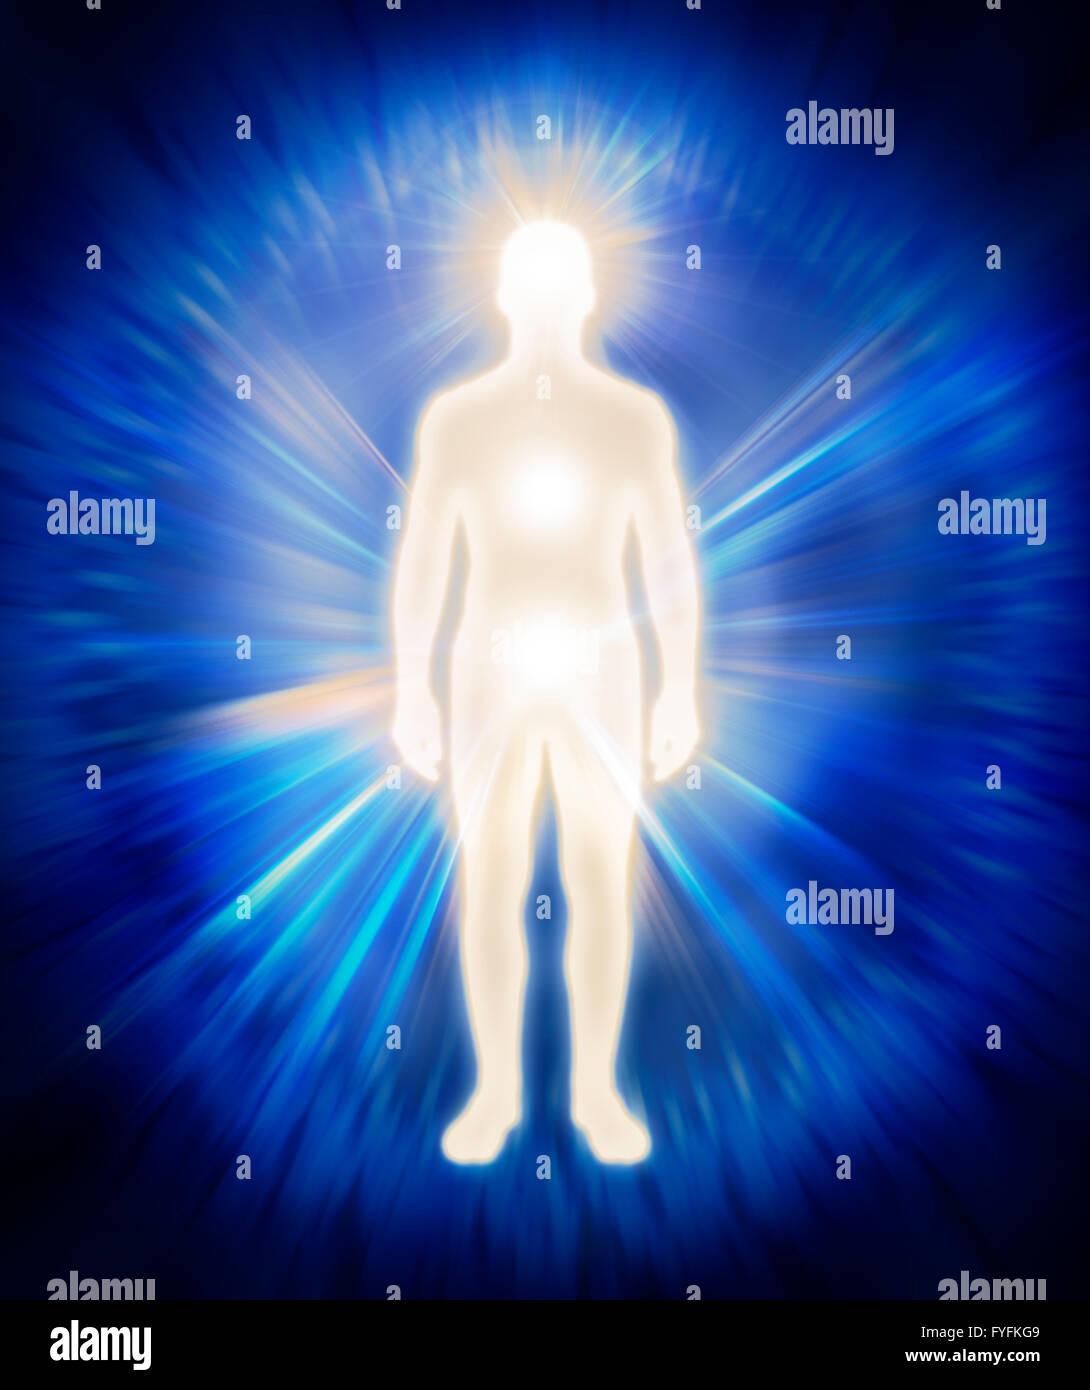 Man emitting rays of light, glowing aura Stock Photo - Alamy